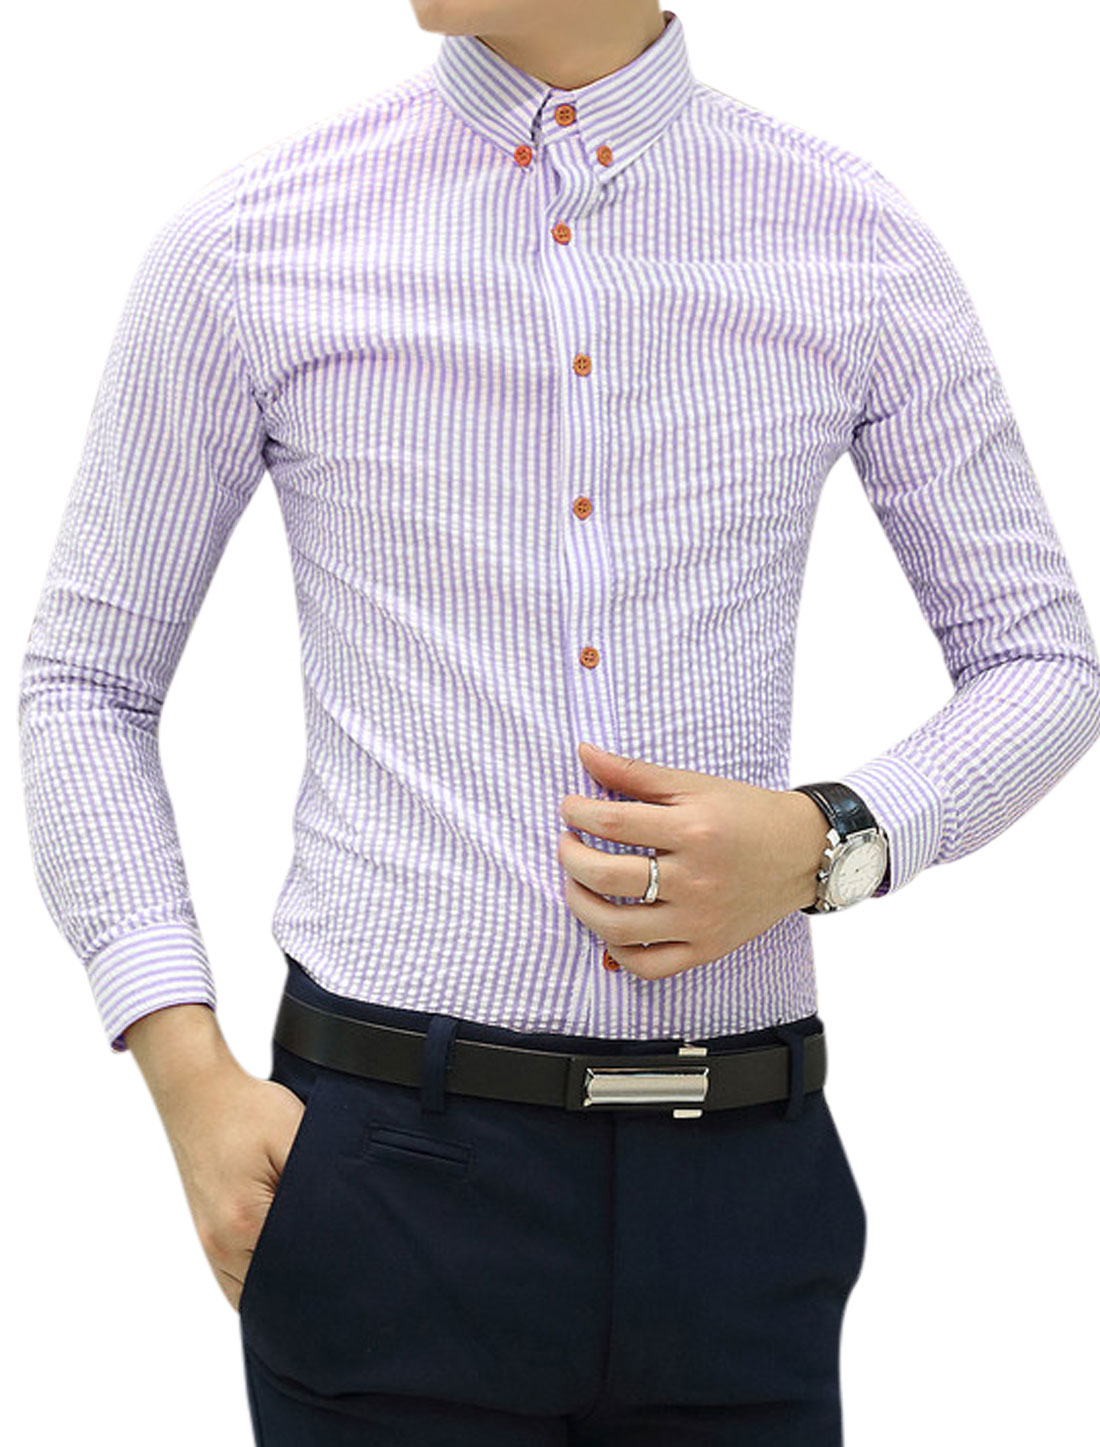 Men Long Sleeves Stripes Button Cuffs Purple White Casual Shirt S